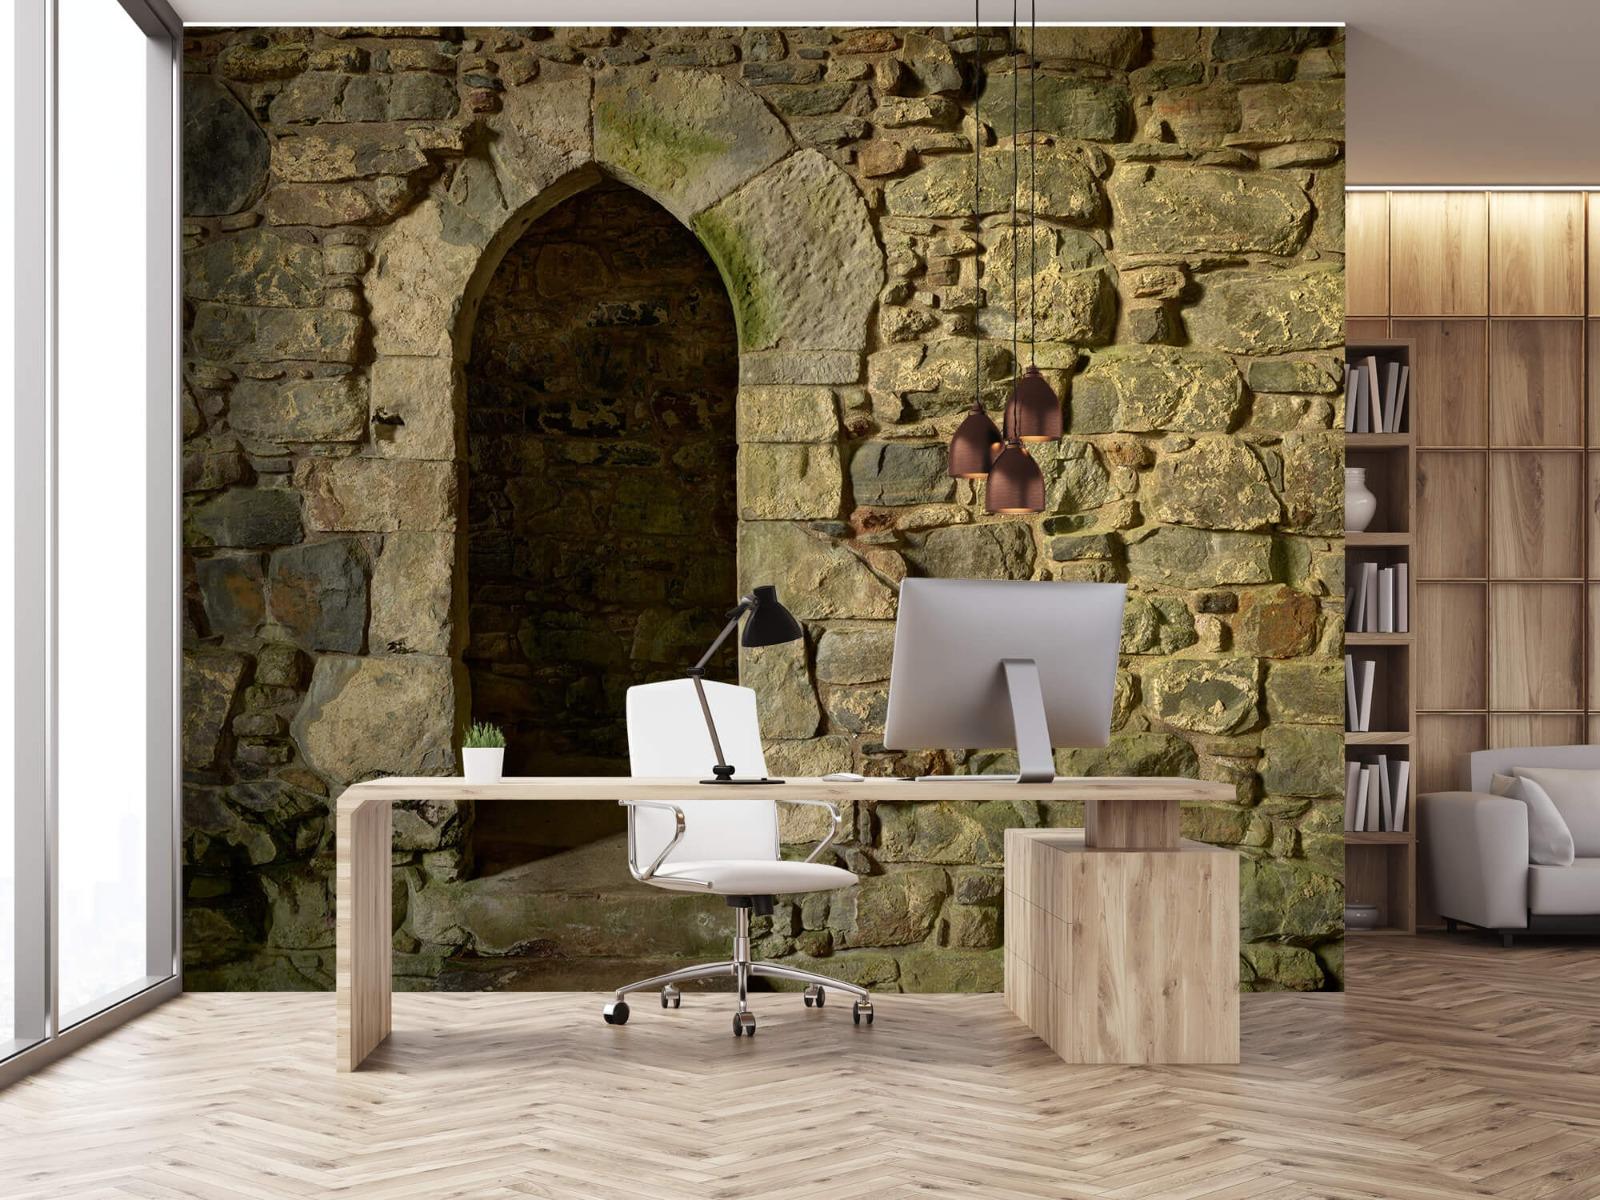 Steen behang - Oude muur met doorgang - Slaapkamer 24